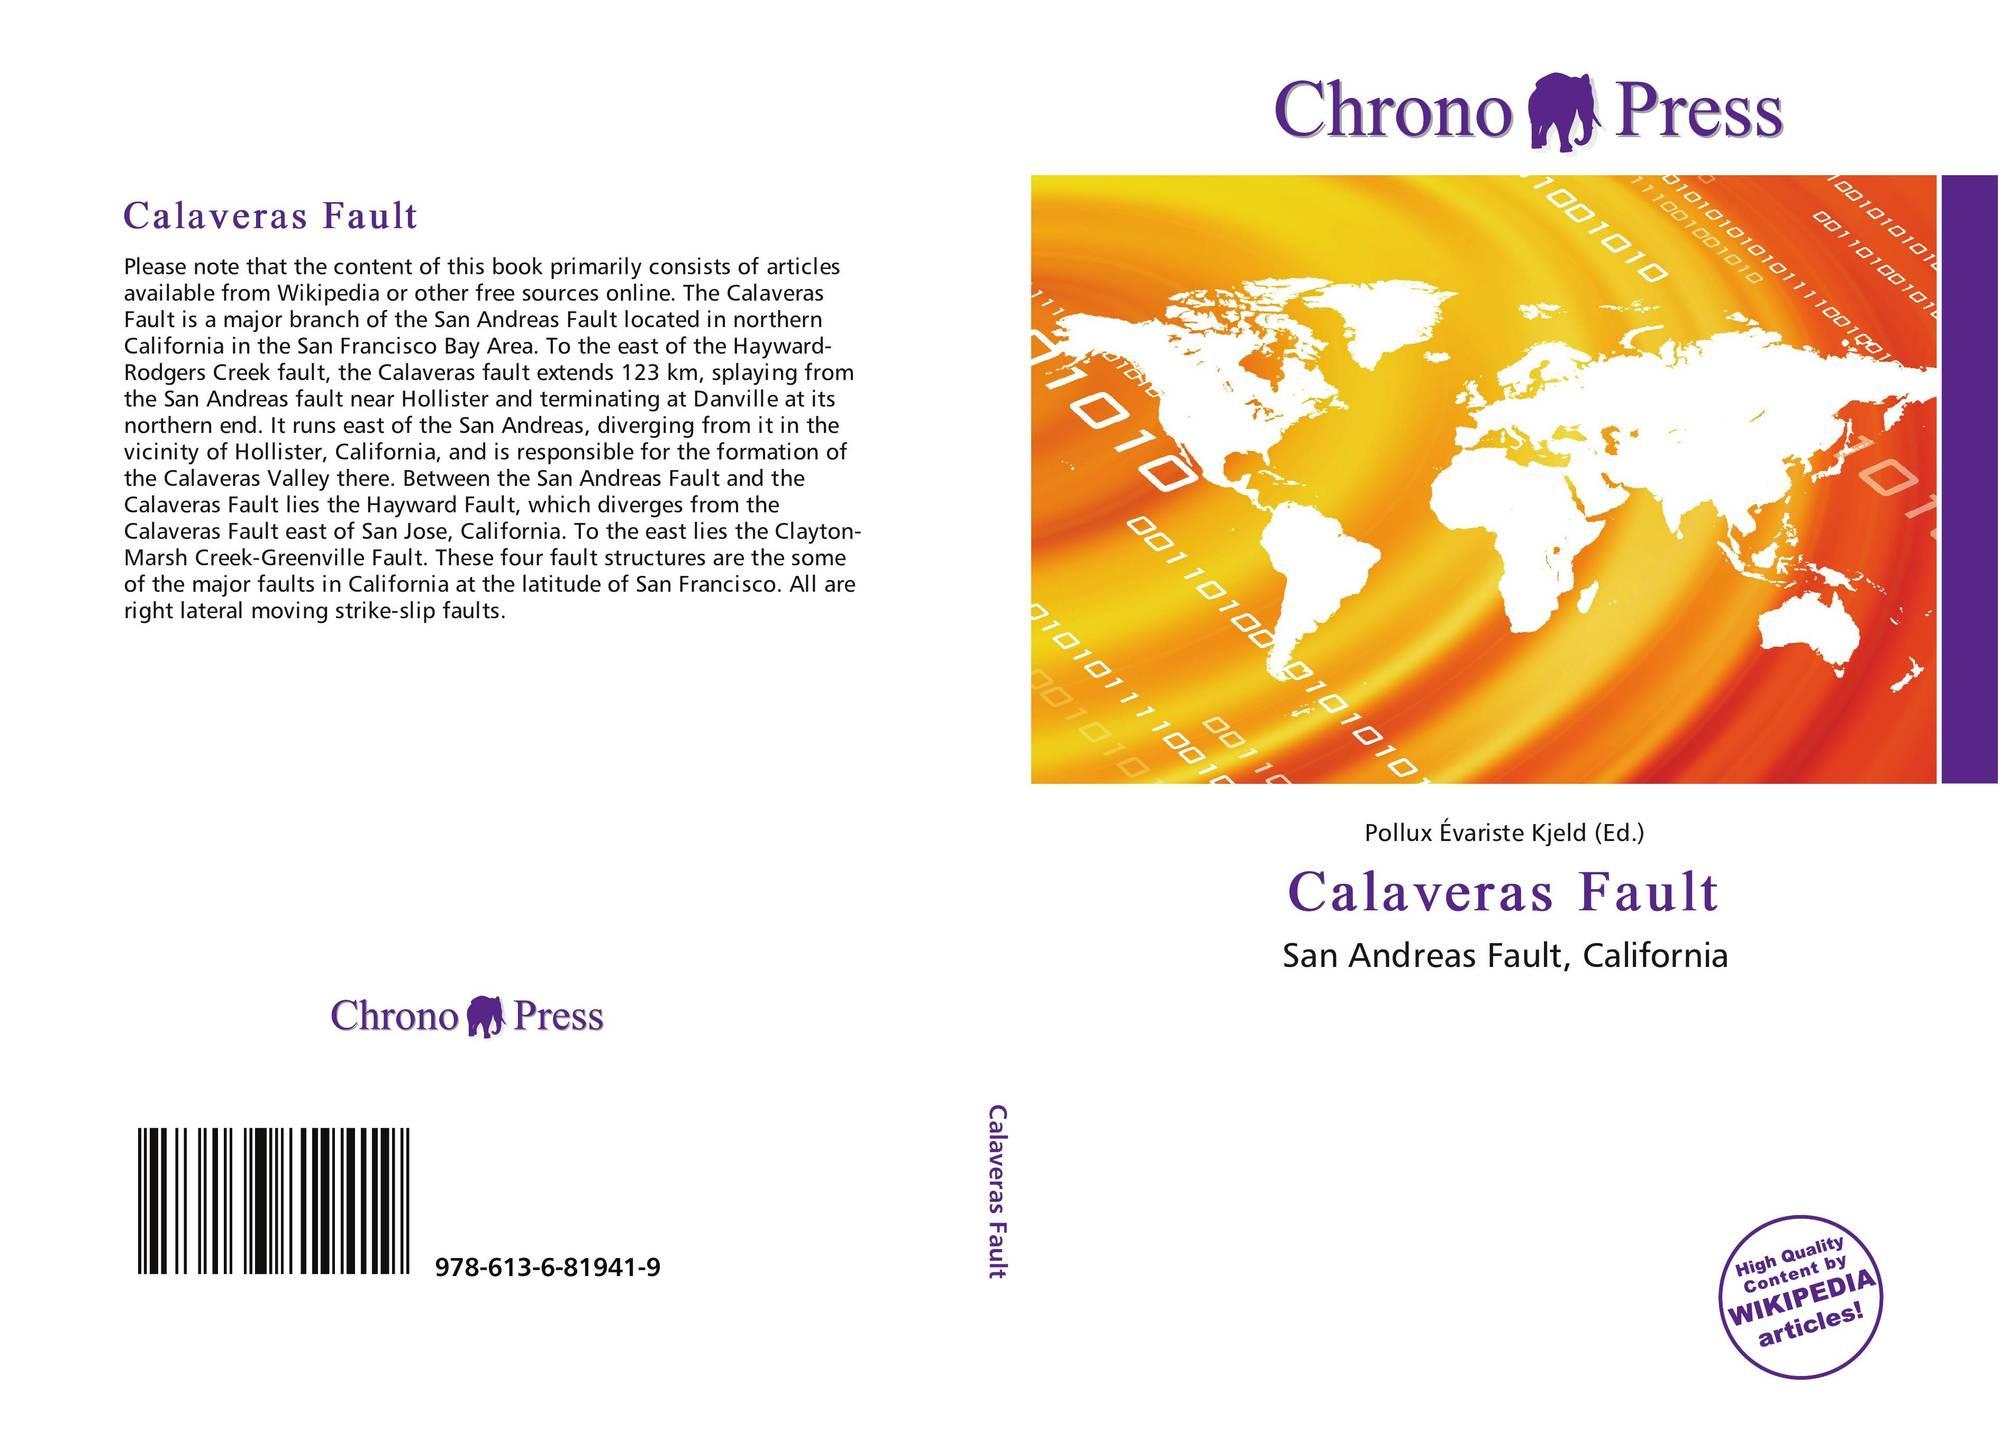 Amber Clayton Wikipedia calaveras fault, 978-613-6-81941-9, 6136819414 ,9786136819419